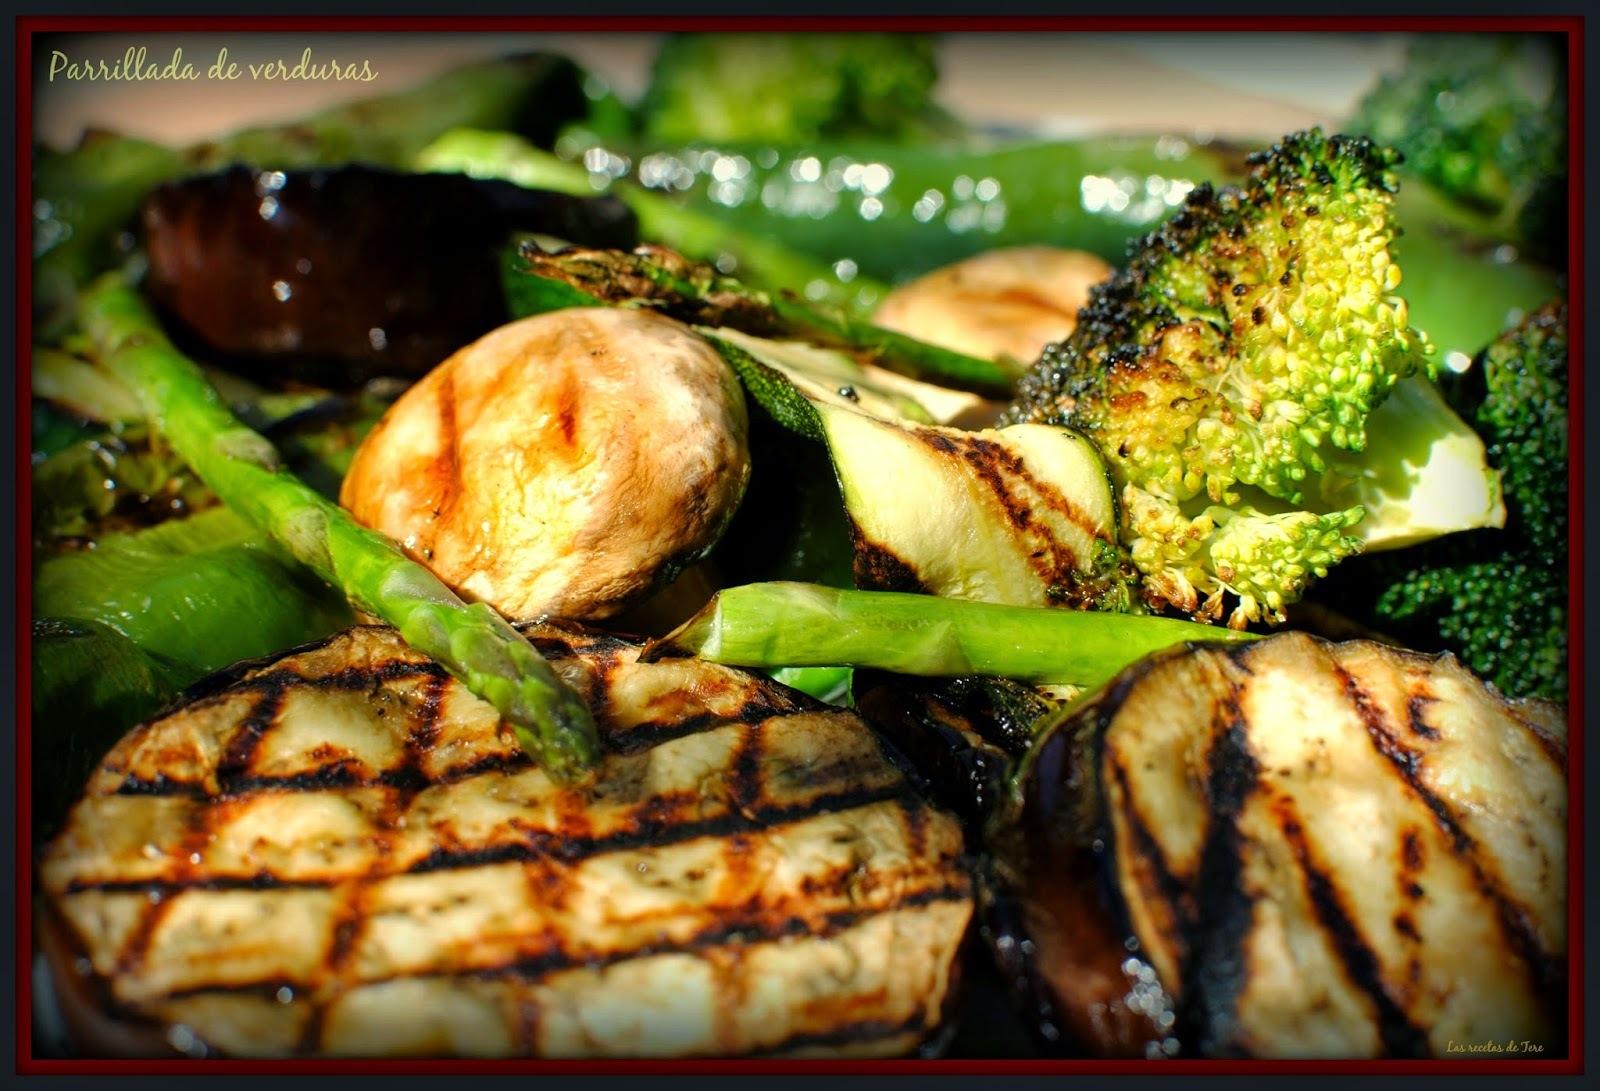 Parrillada de verduras.